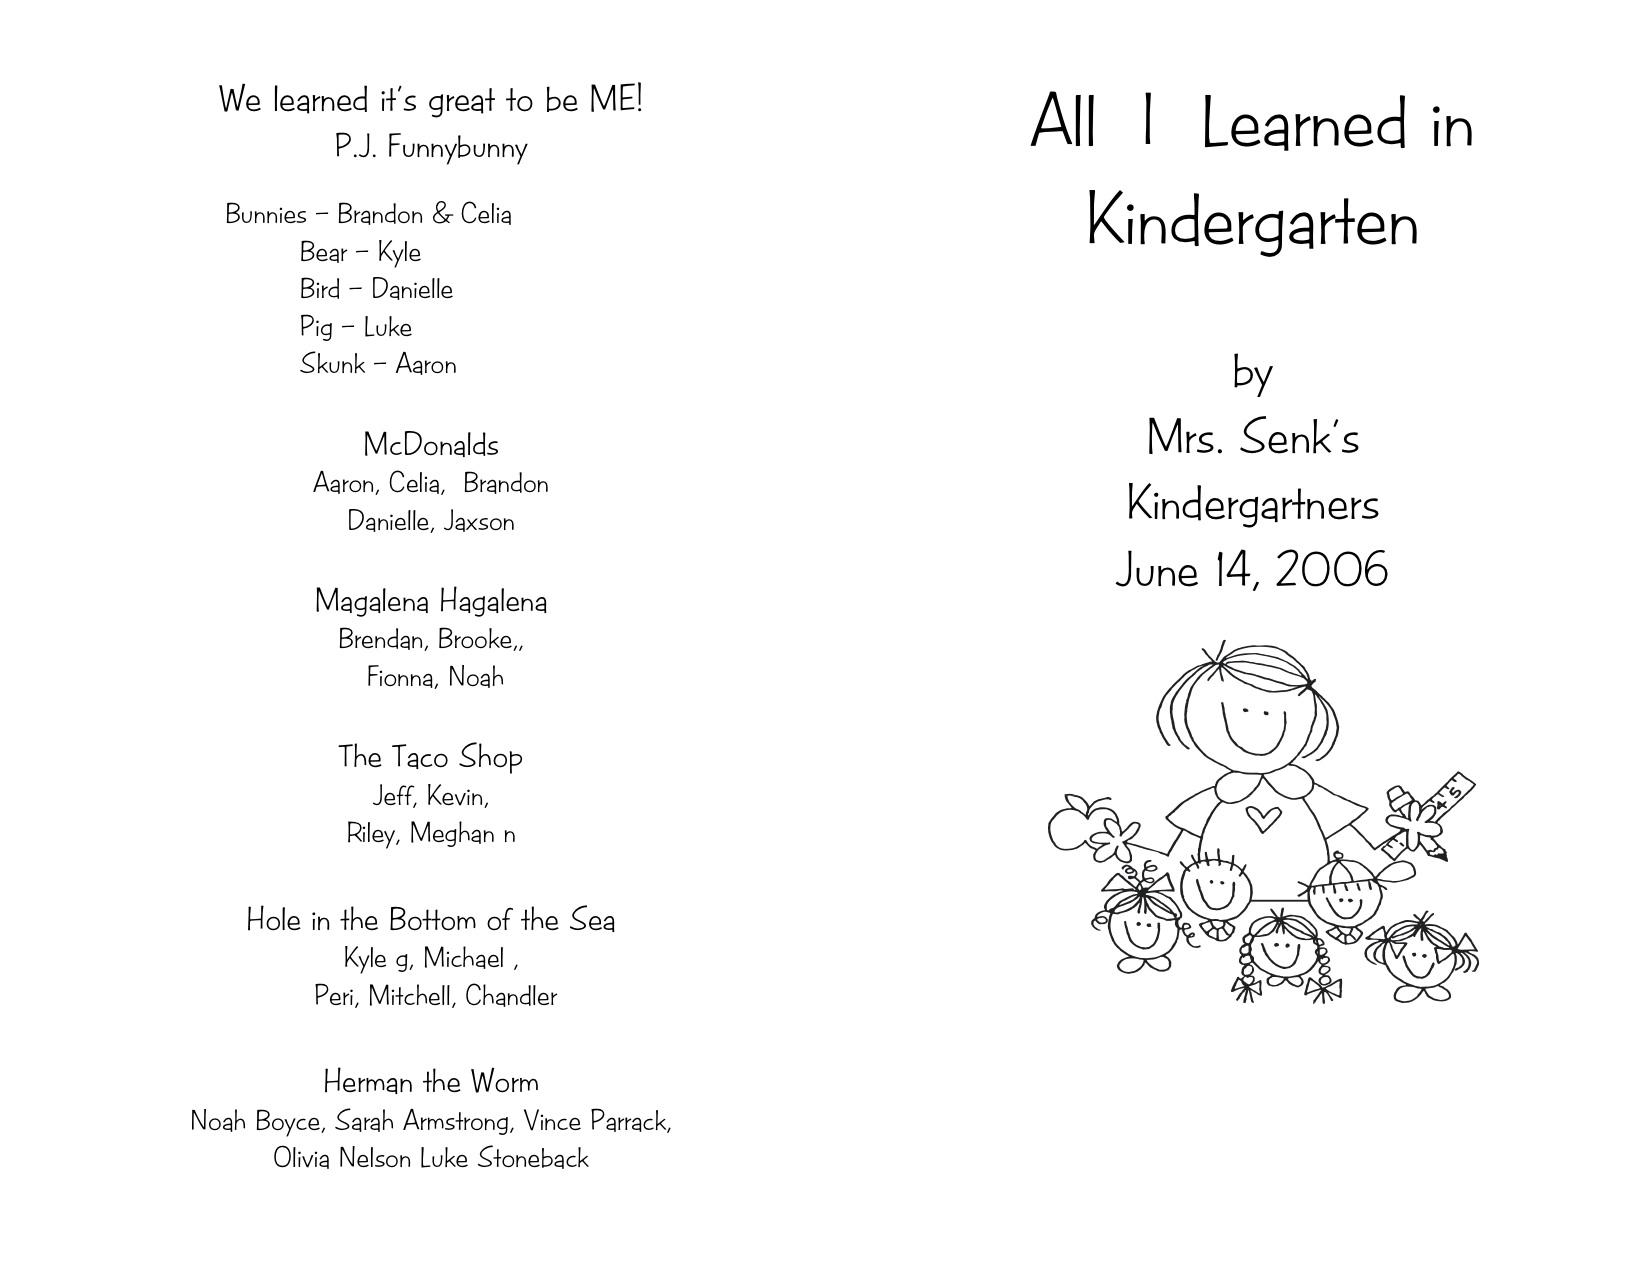 Preschool Promotion Certificates Preschool Promotion